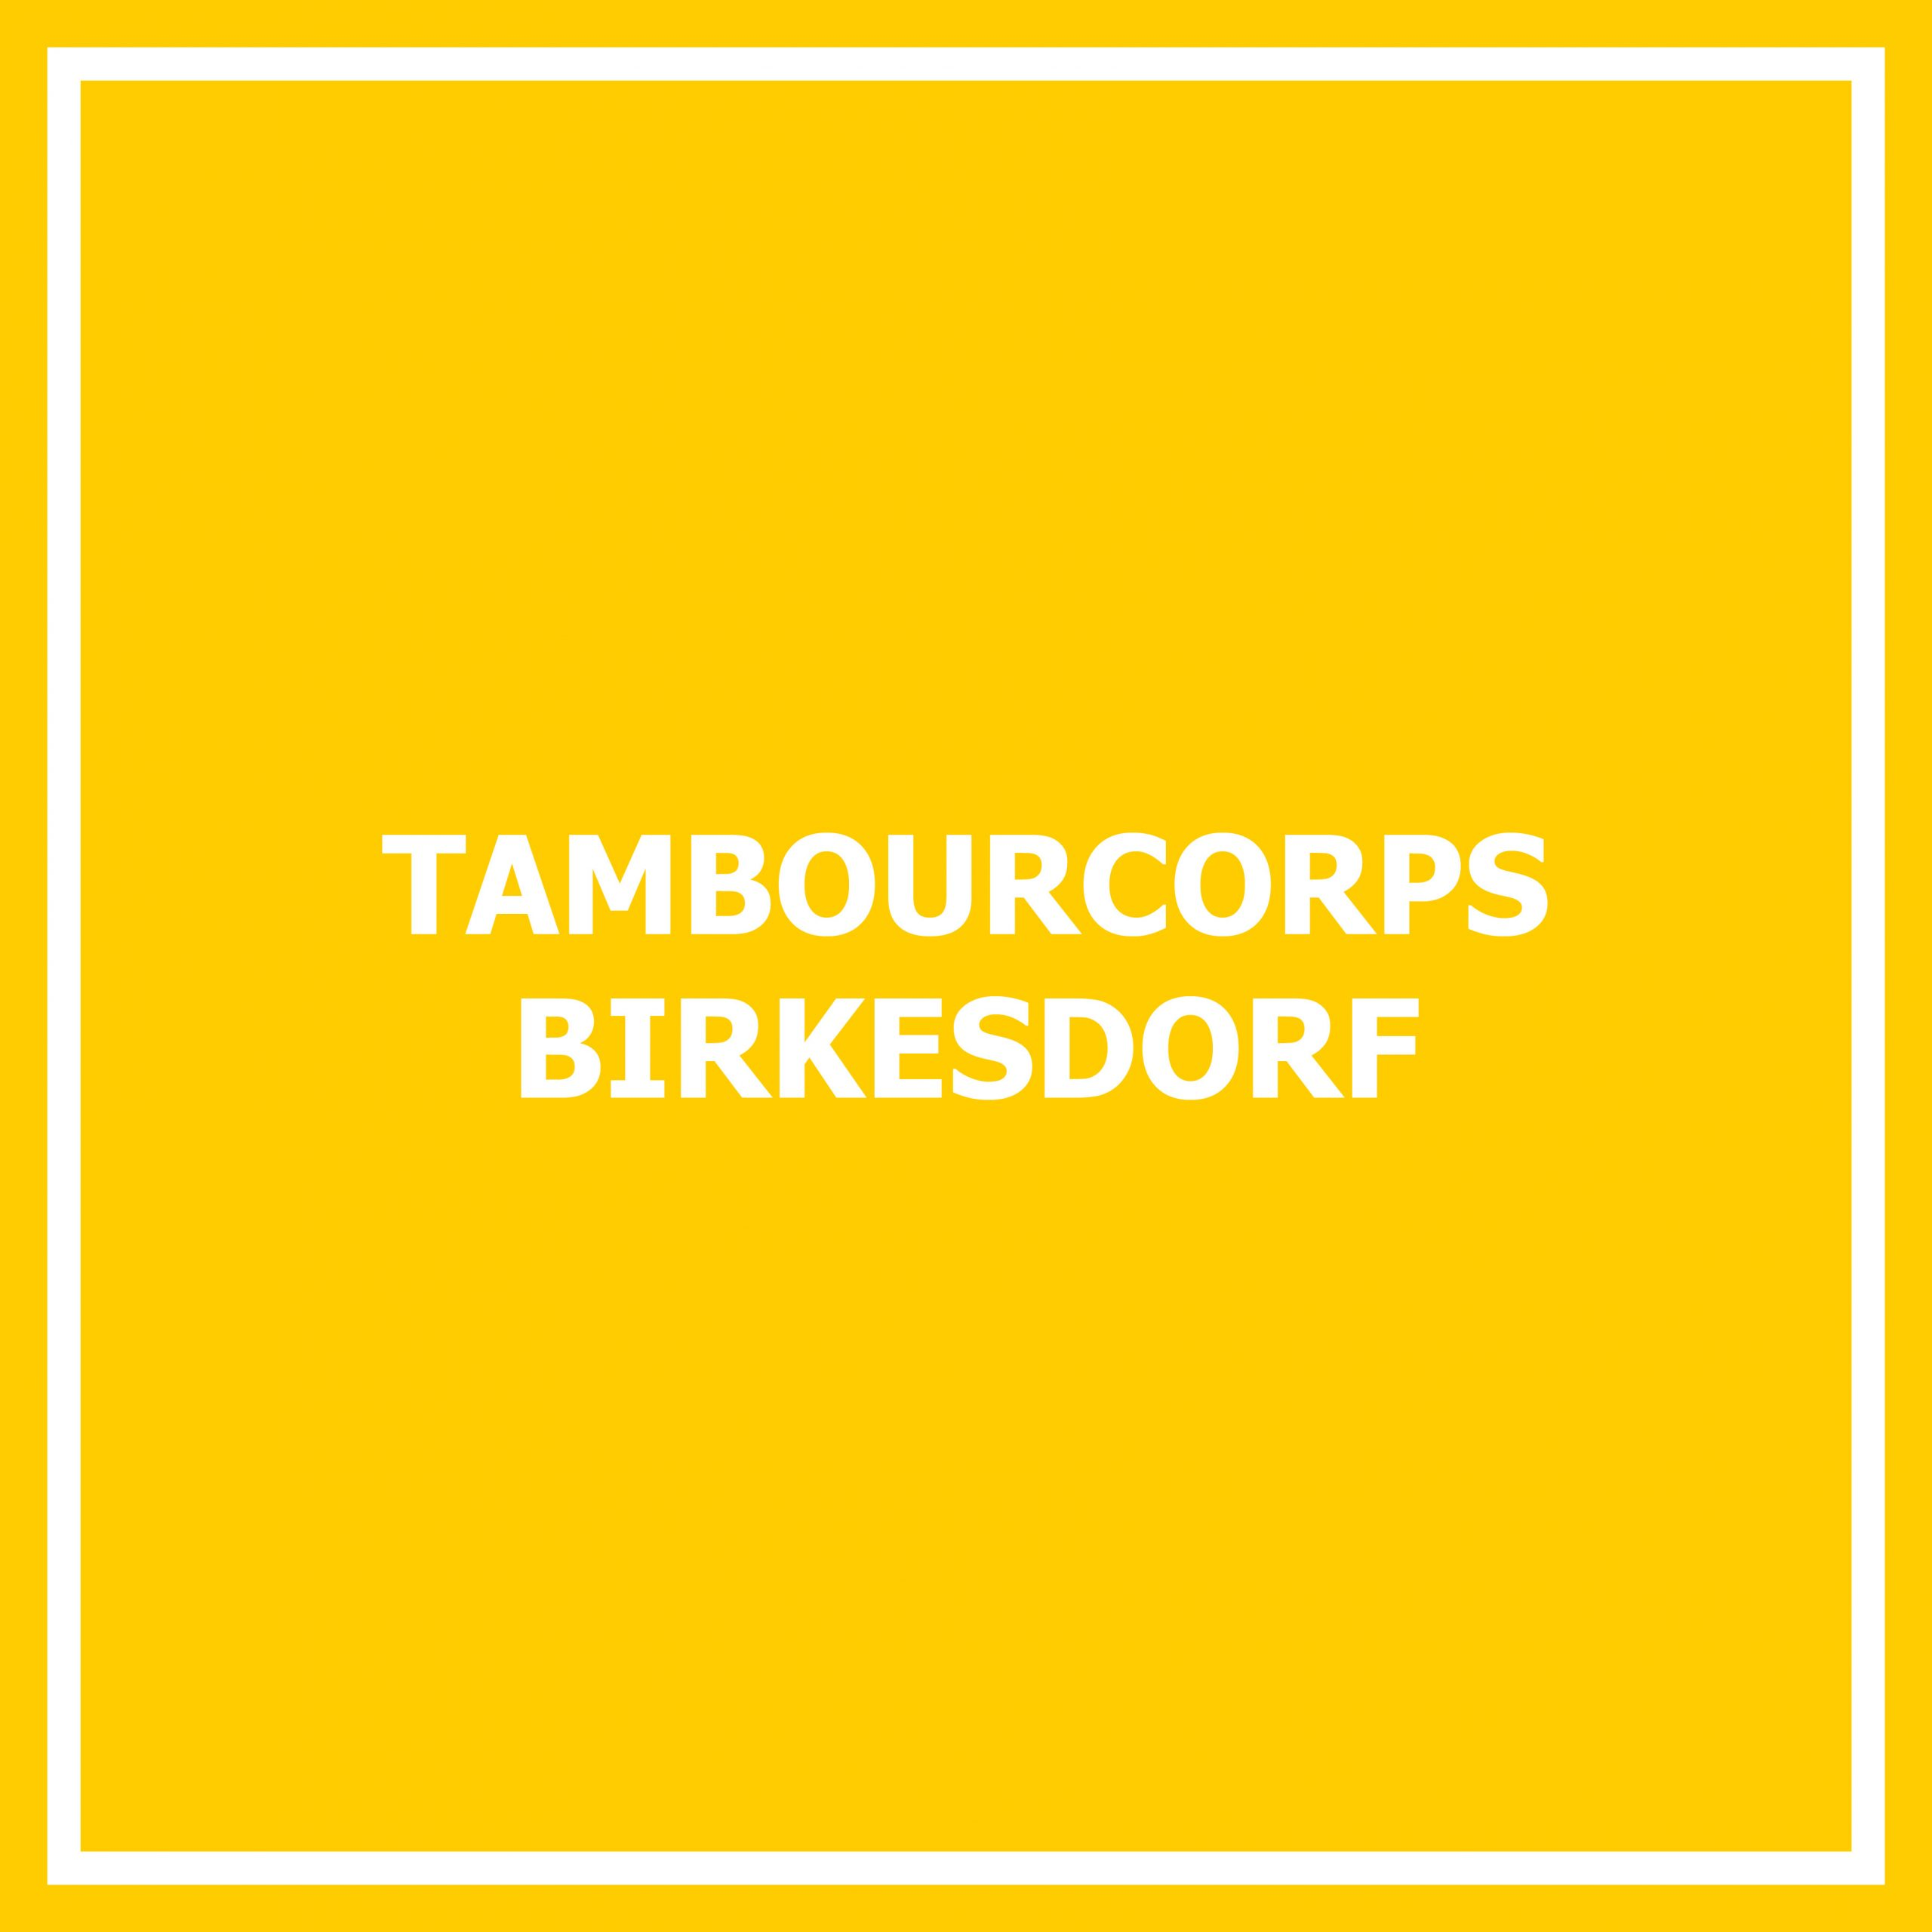 Tambourcorps Birkesdorf